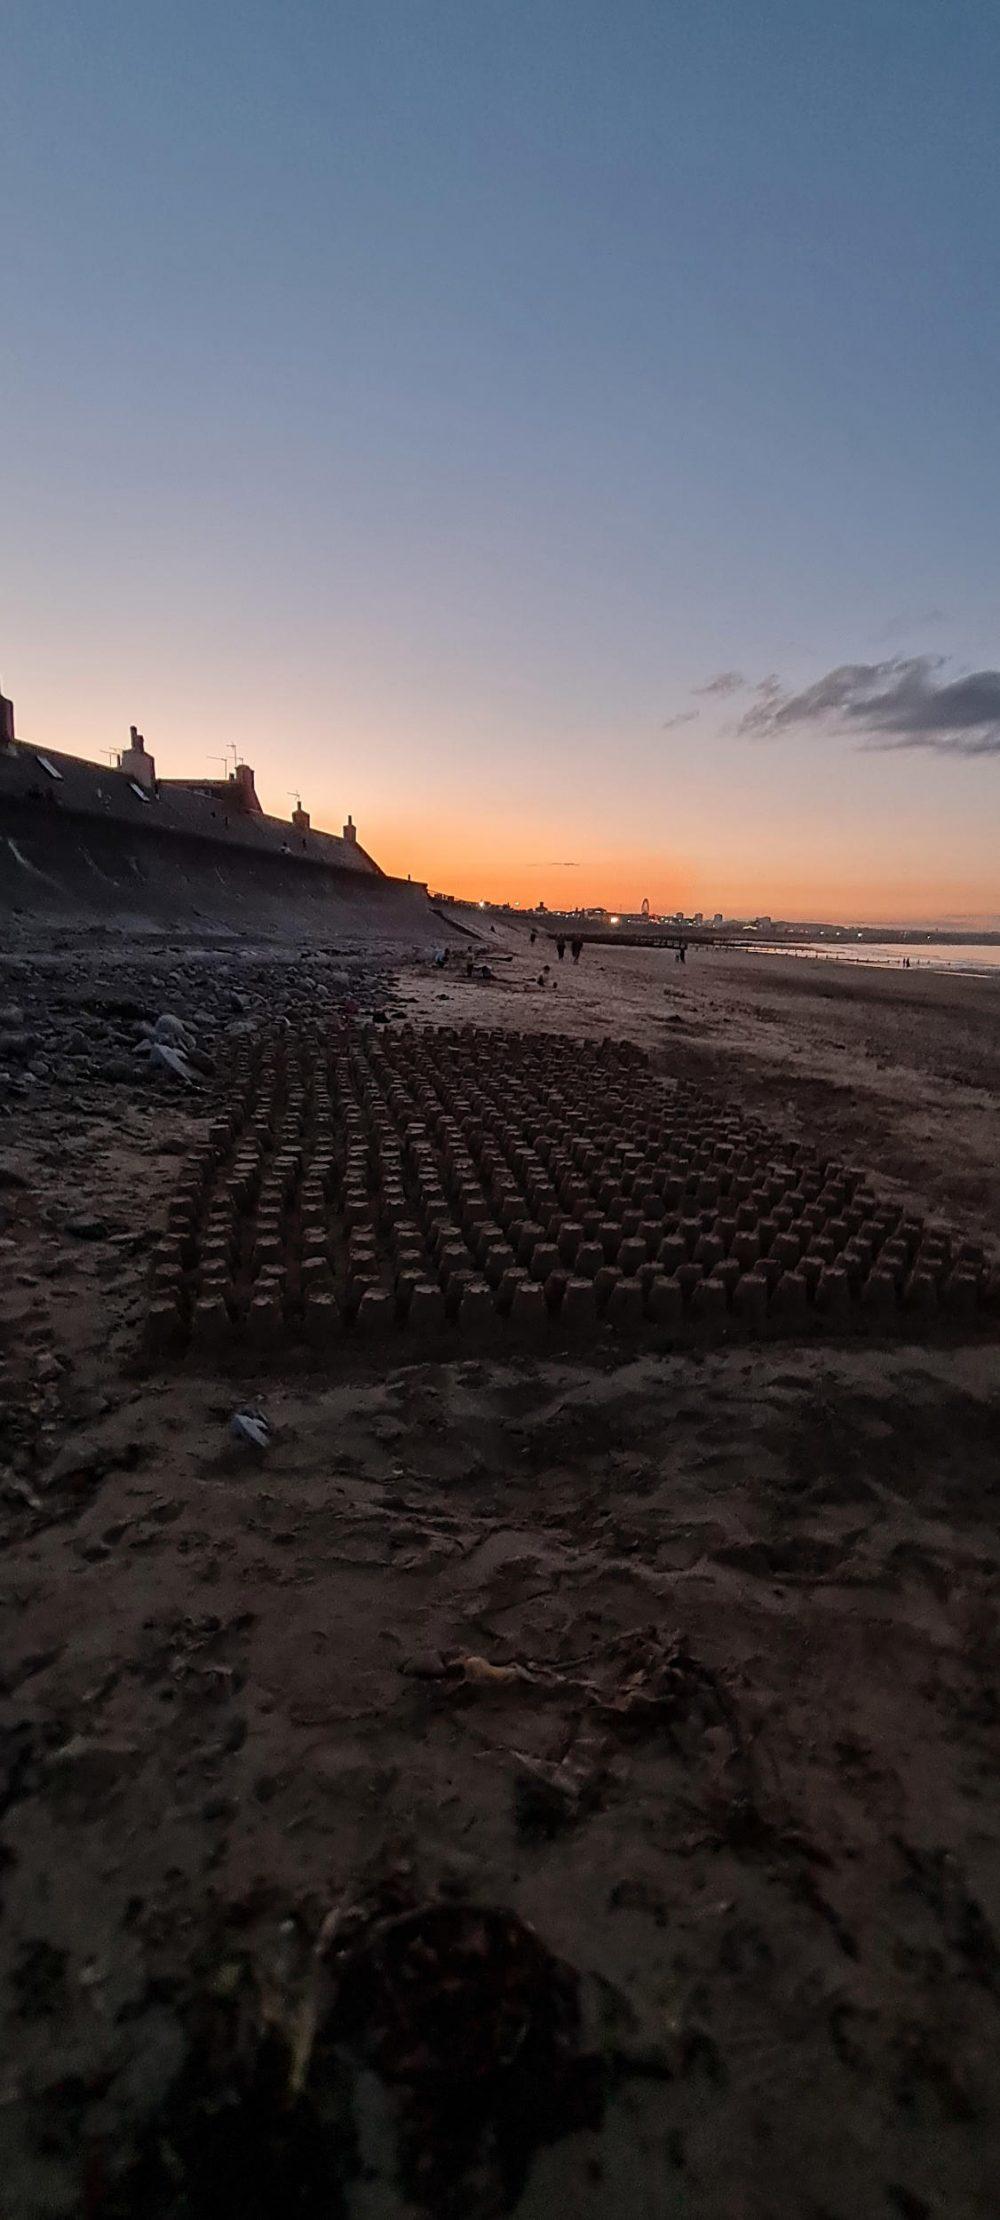 Sun setting over sandcastle tribute | Scottish Health News